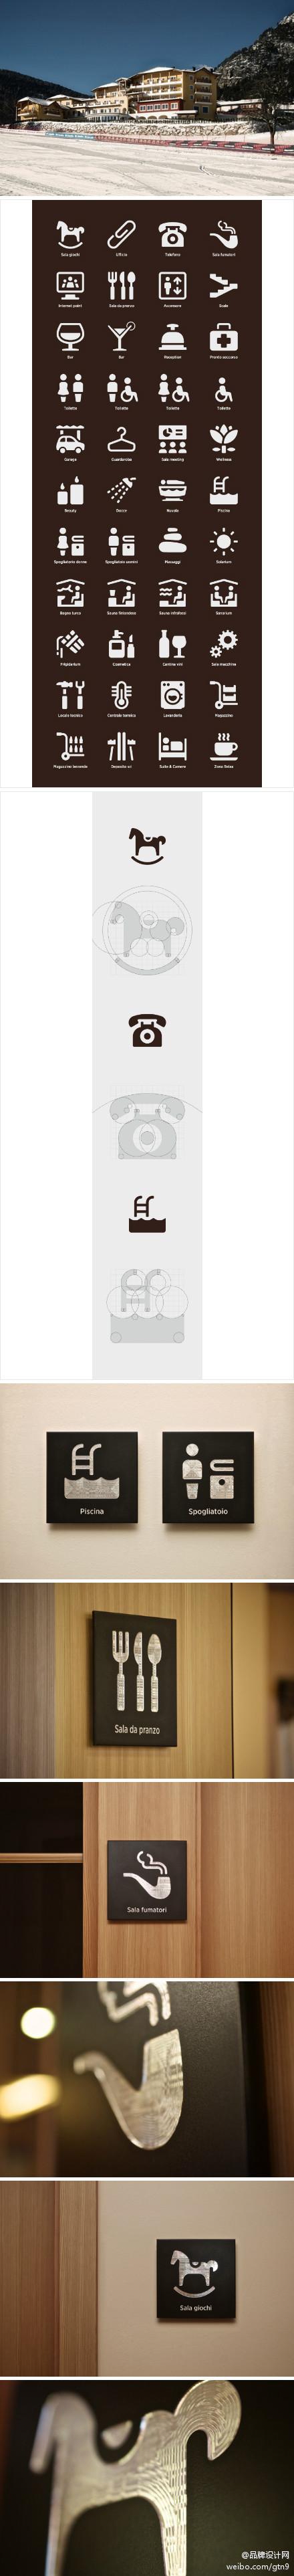 Al sole illustrations pinterest for Programmi per interior design